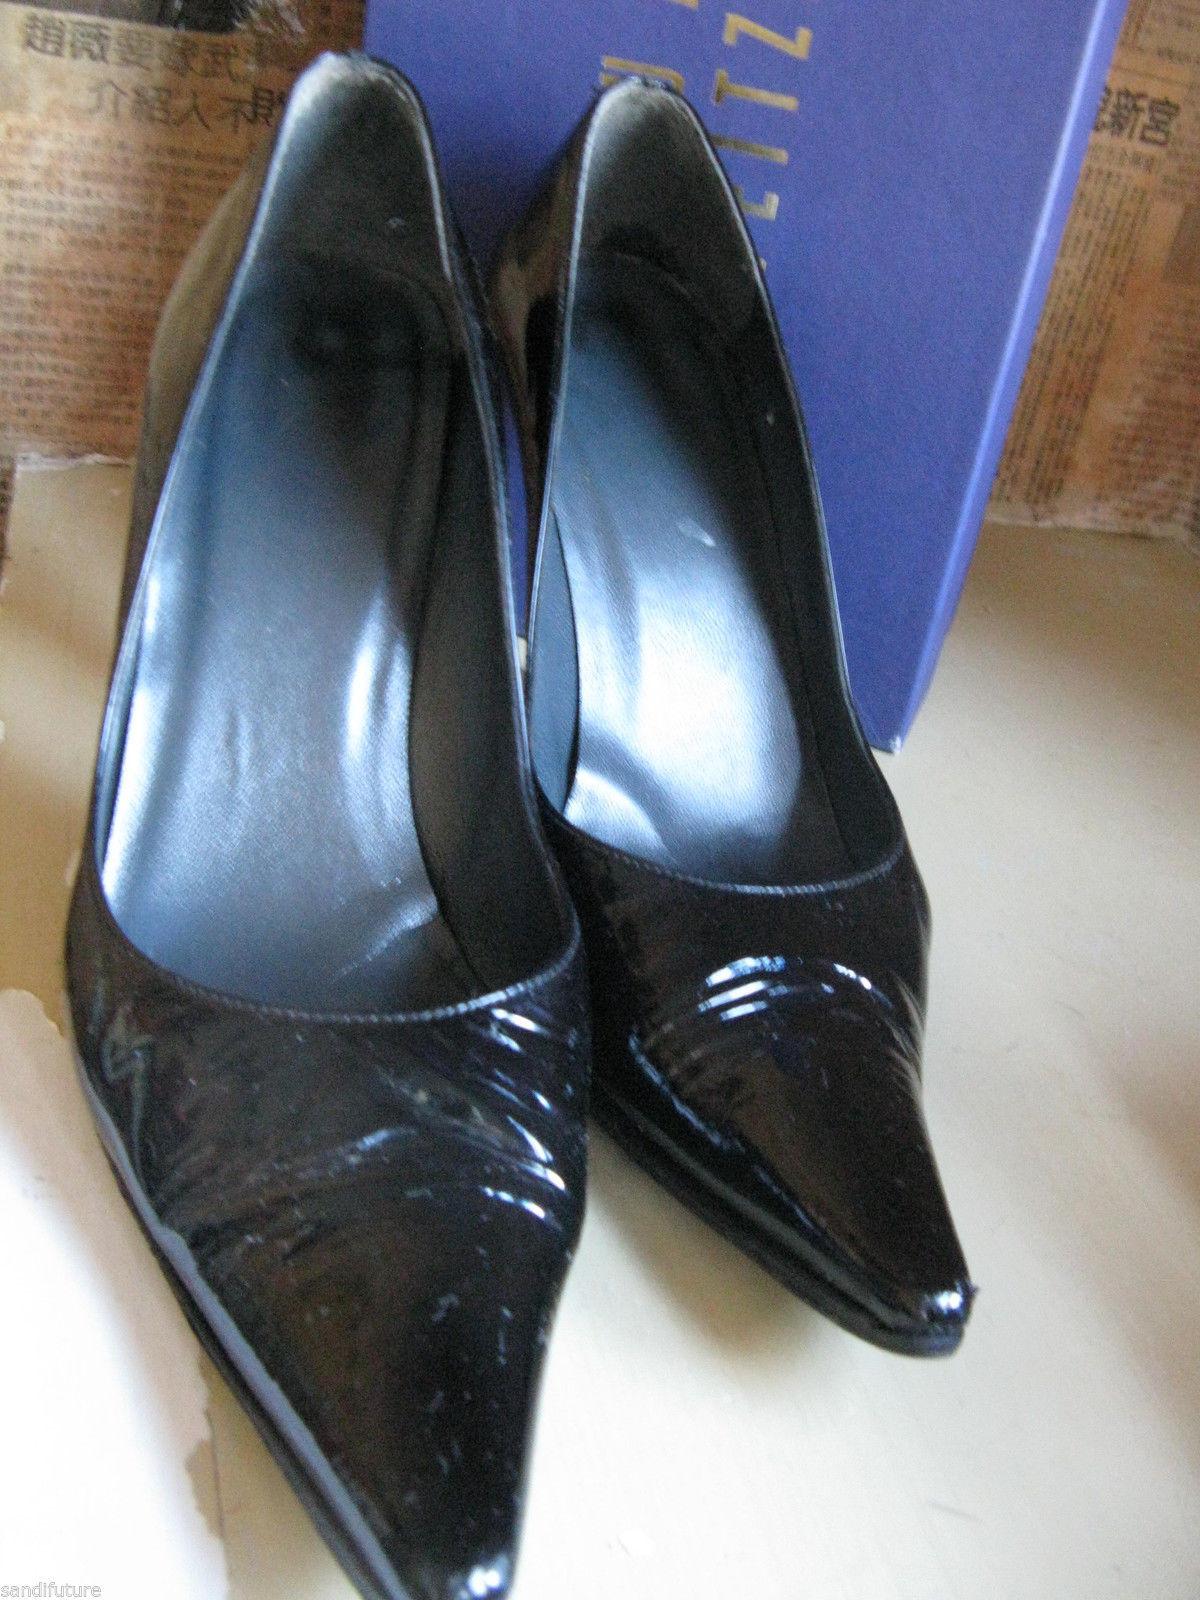 Stuart Weitzman classic stiletto Lady patent pump heels 7 UK4.5 37 VLV